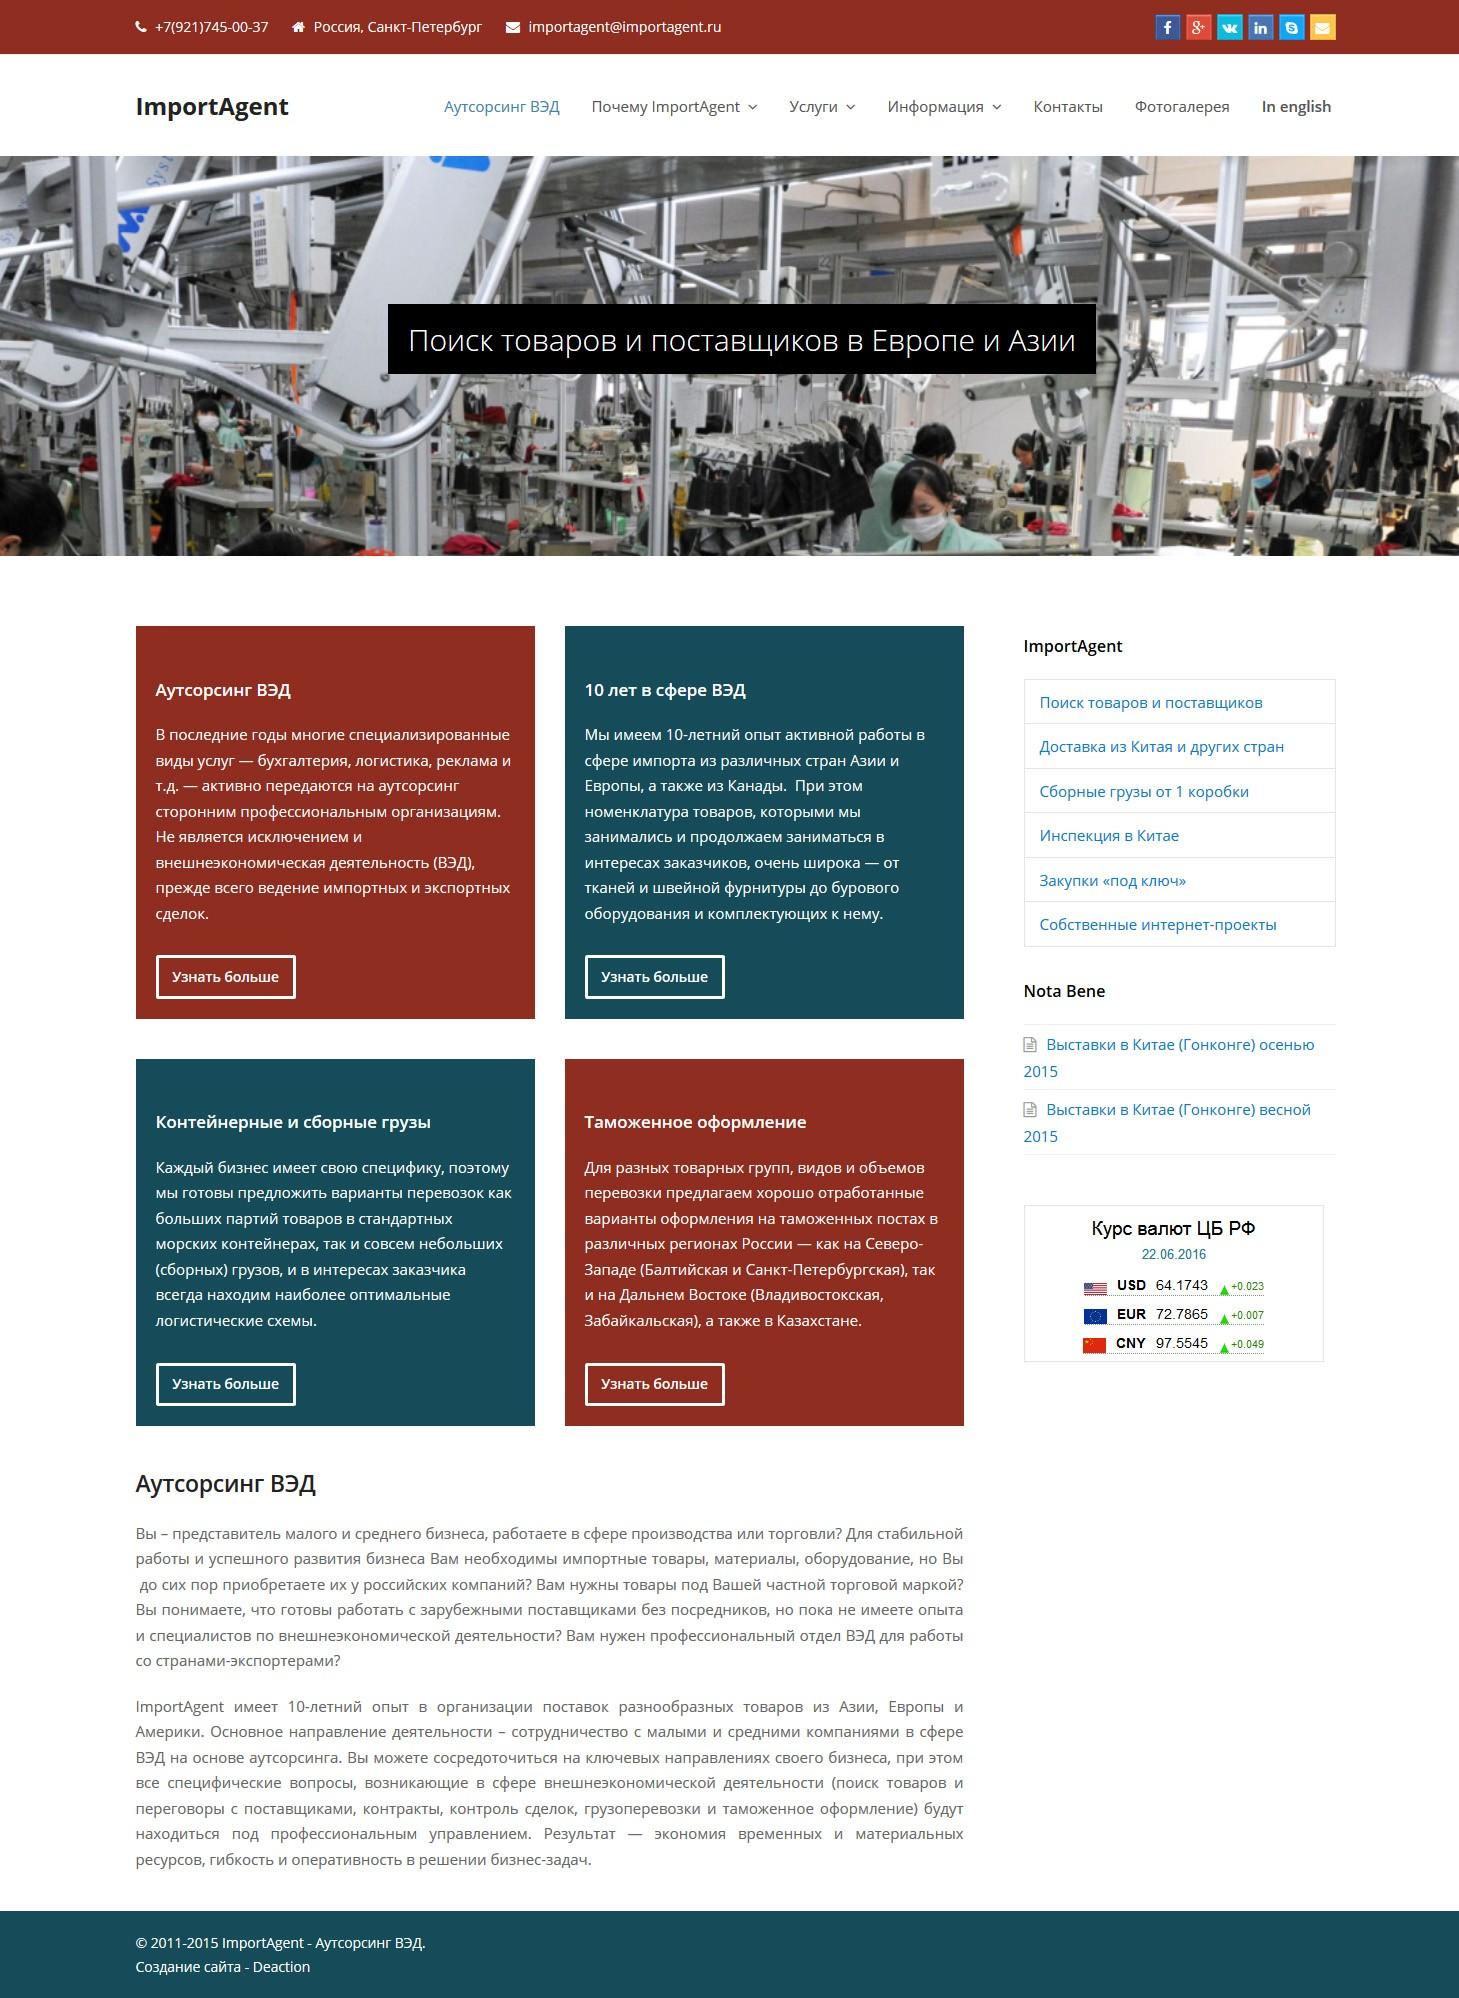 import agent аутсорсинг ВЭД создание сайта